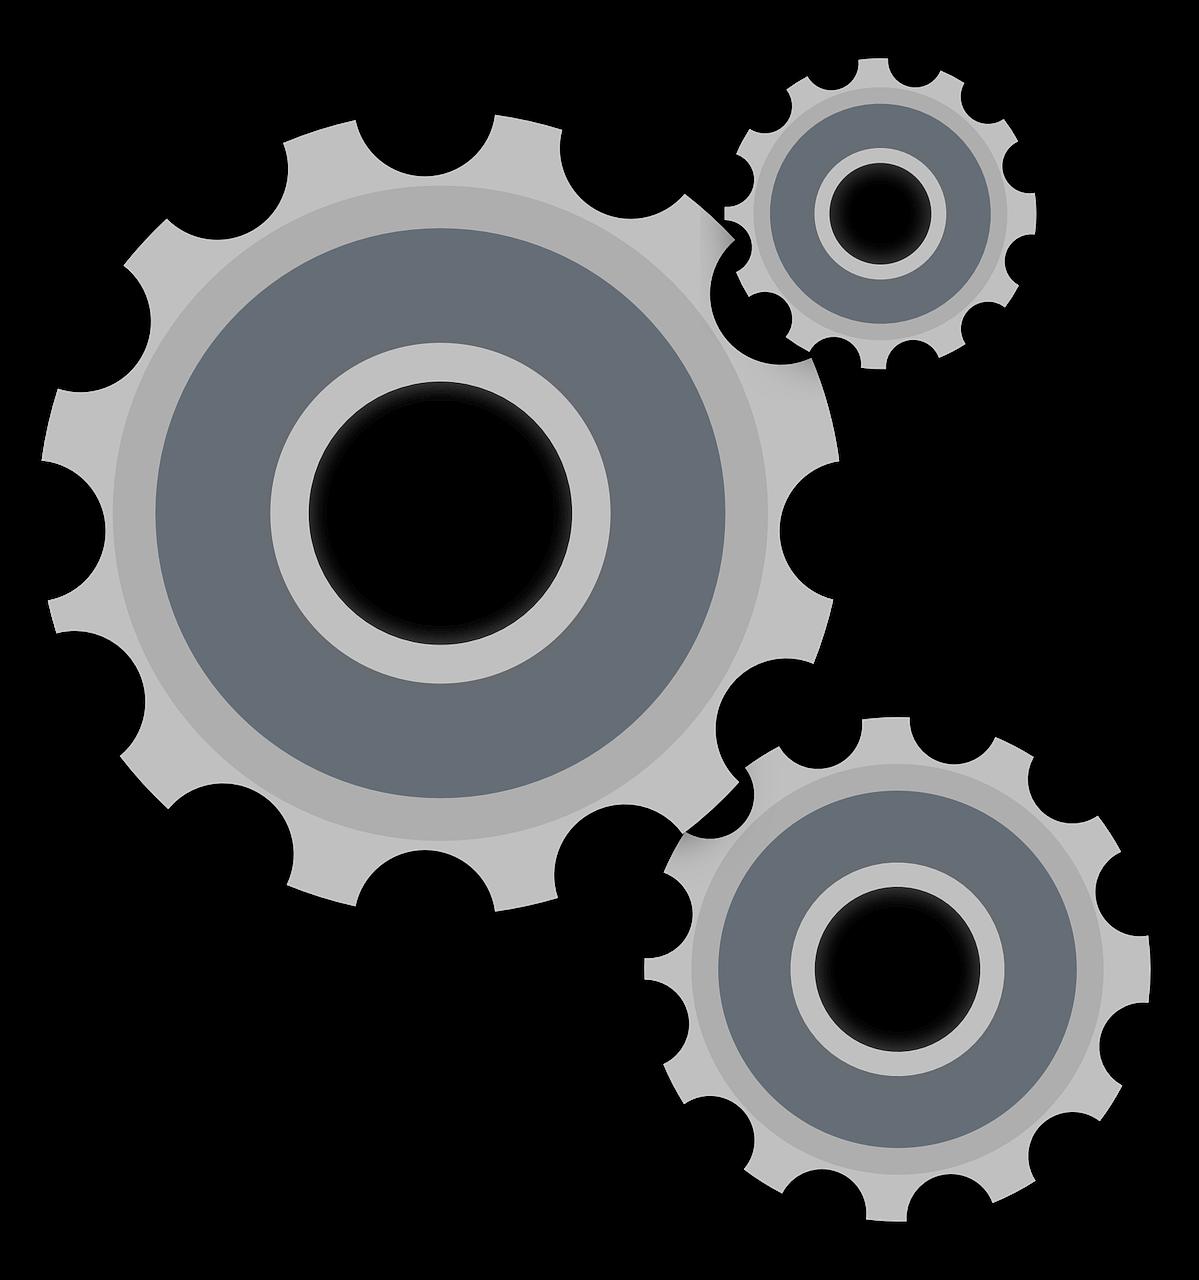 Wheel clipart mechanical. Gear cog tools rack